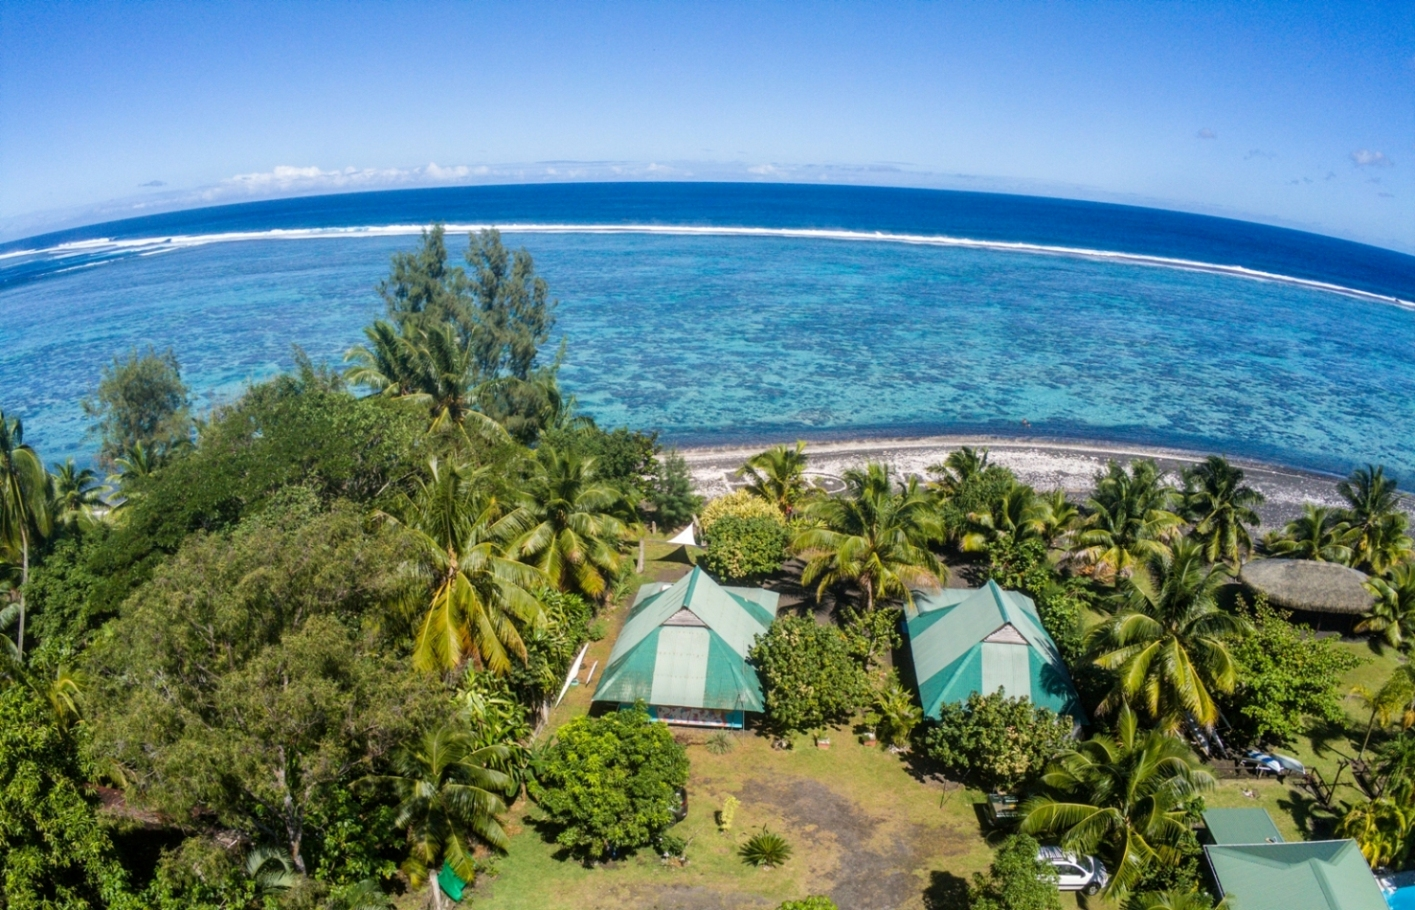 https://tahititourisme.jp/wp-content/uploads/2019/08/copie-Tahiti-tourisme-948ko.jpg